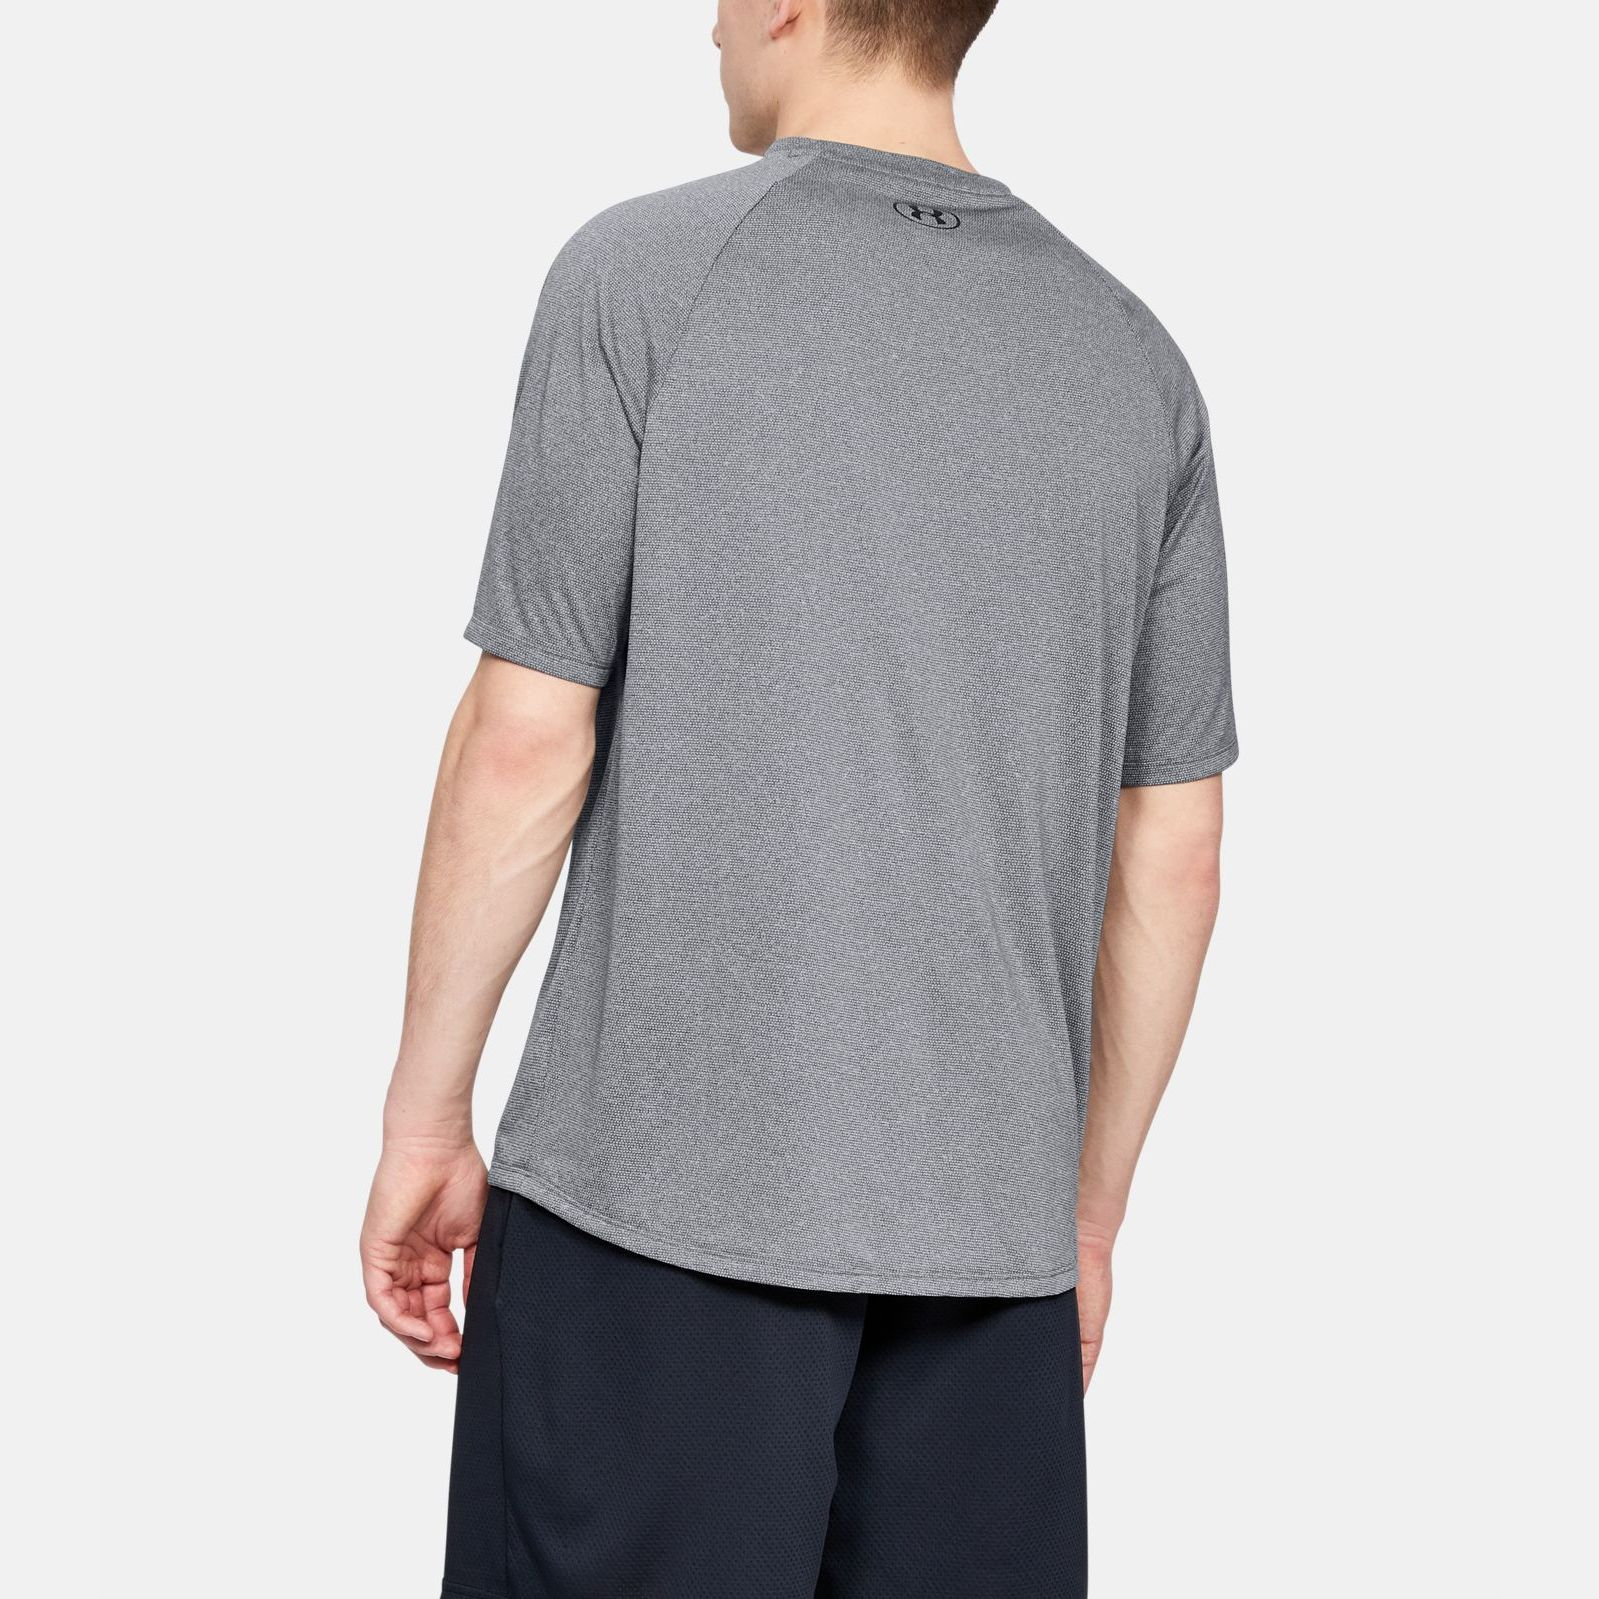 Clothing -  under armour Tech Short Sleeve T-Shirt 5317